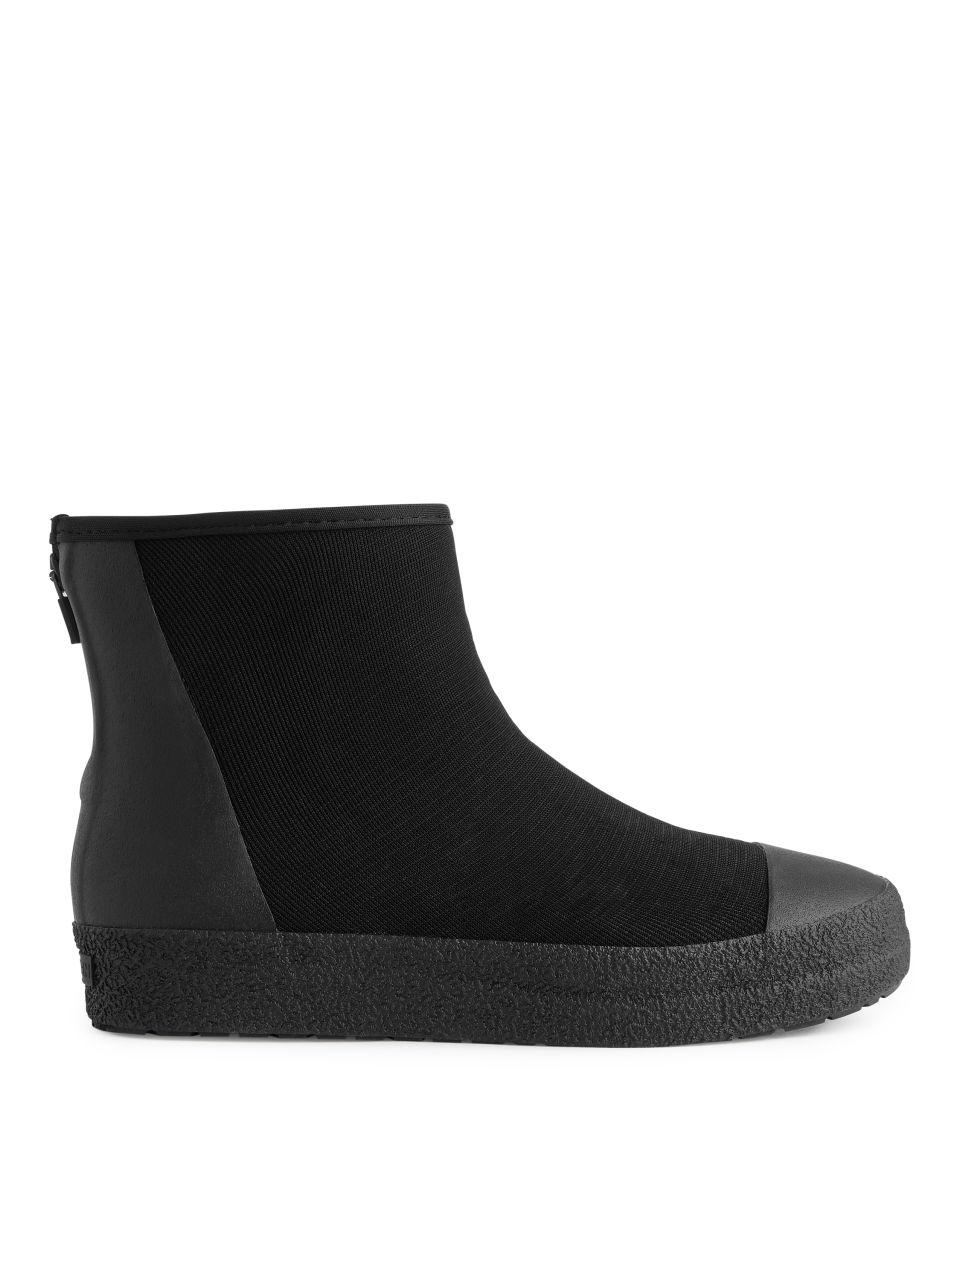 Tretorn Arch Hybrid Boots - Black